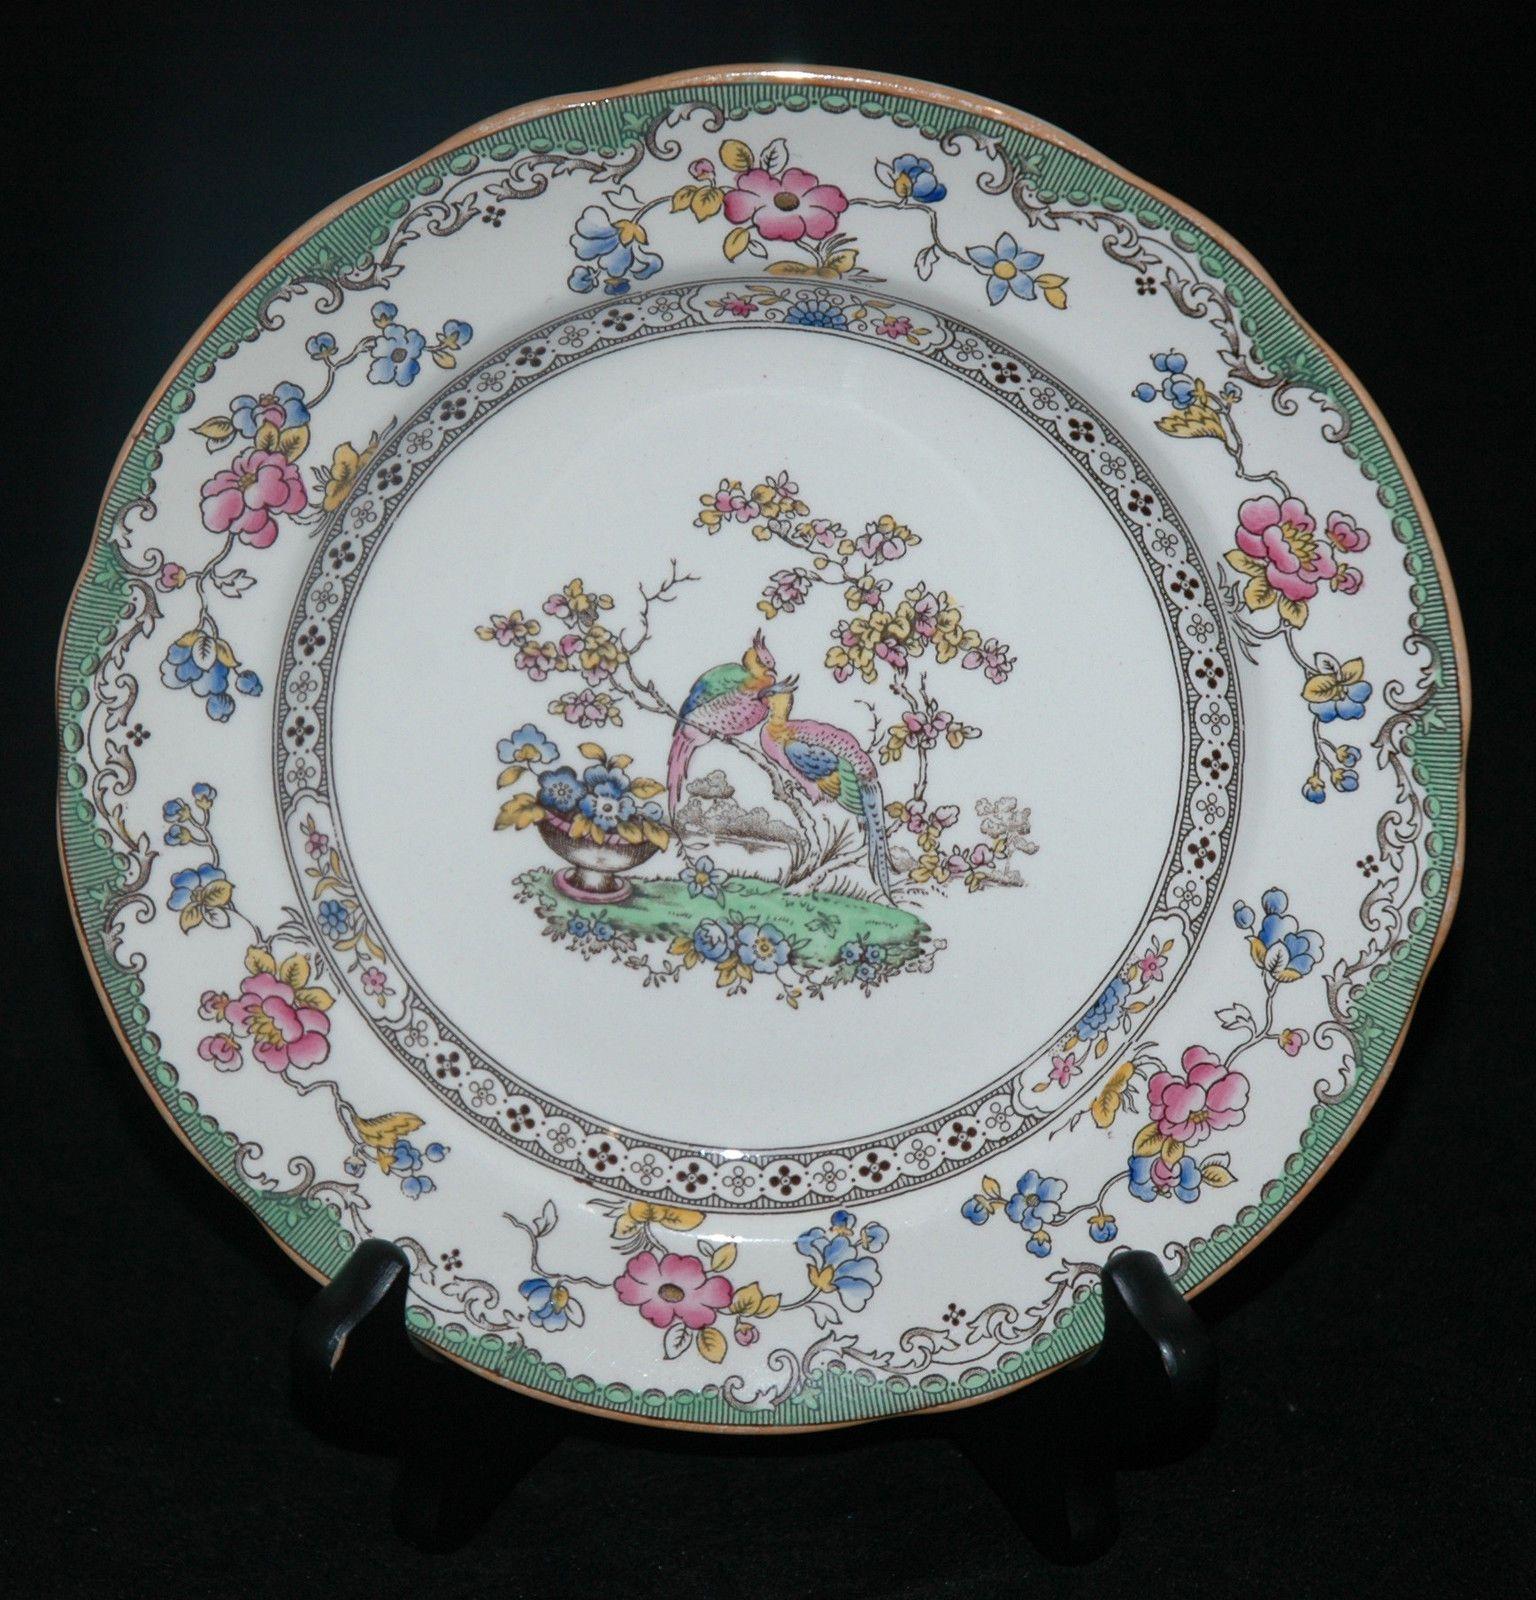 COPELAND SPODE CHINA SALAD PLATE EDEN PATTERN & Copeland spode china salad plate eden pattern   Salad plates China ...